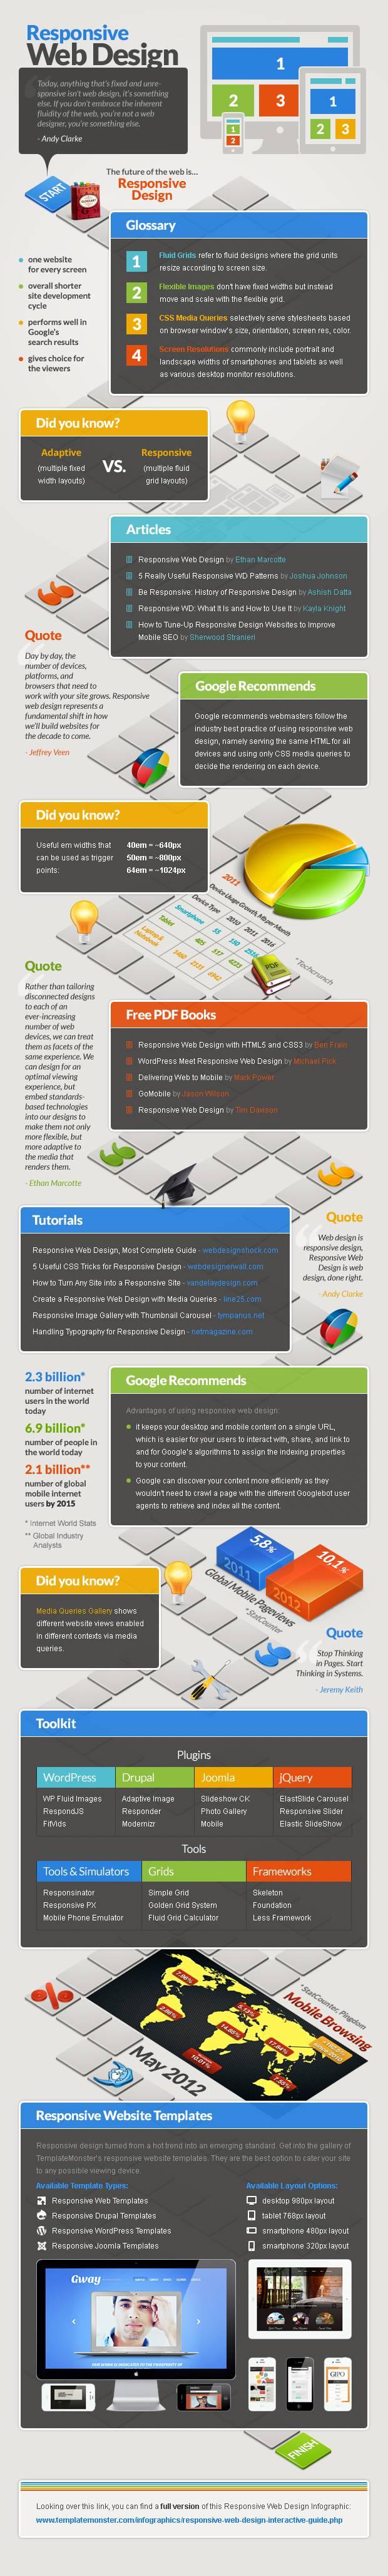 responsive web design interactive guide